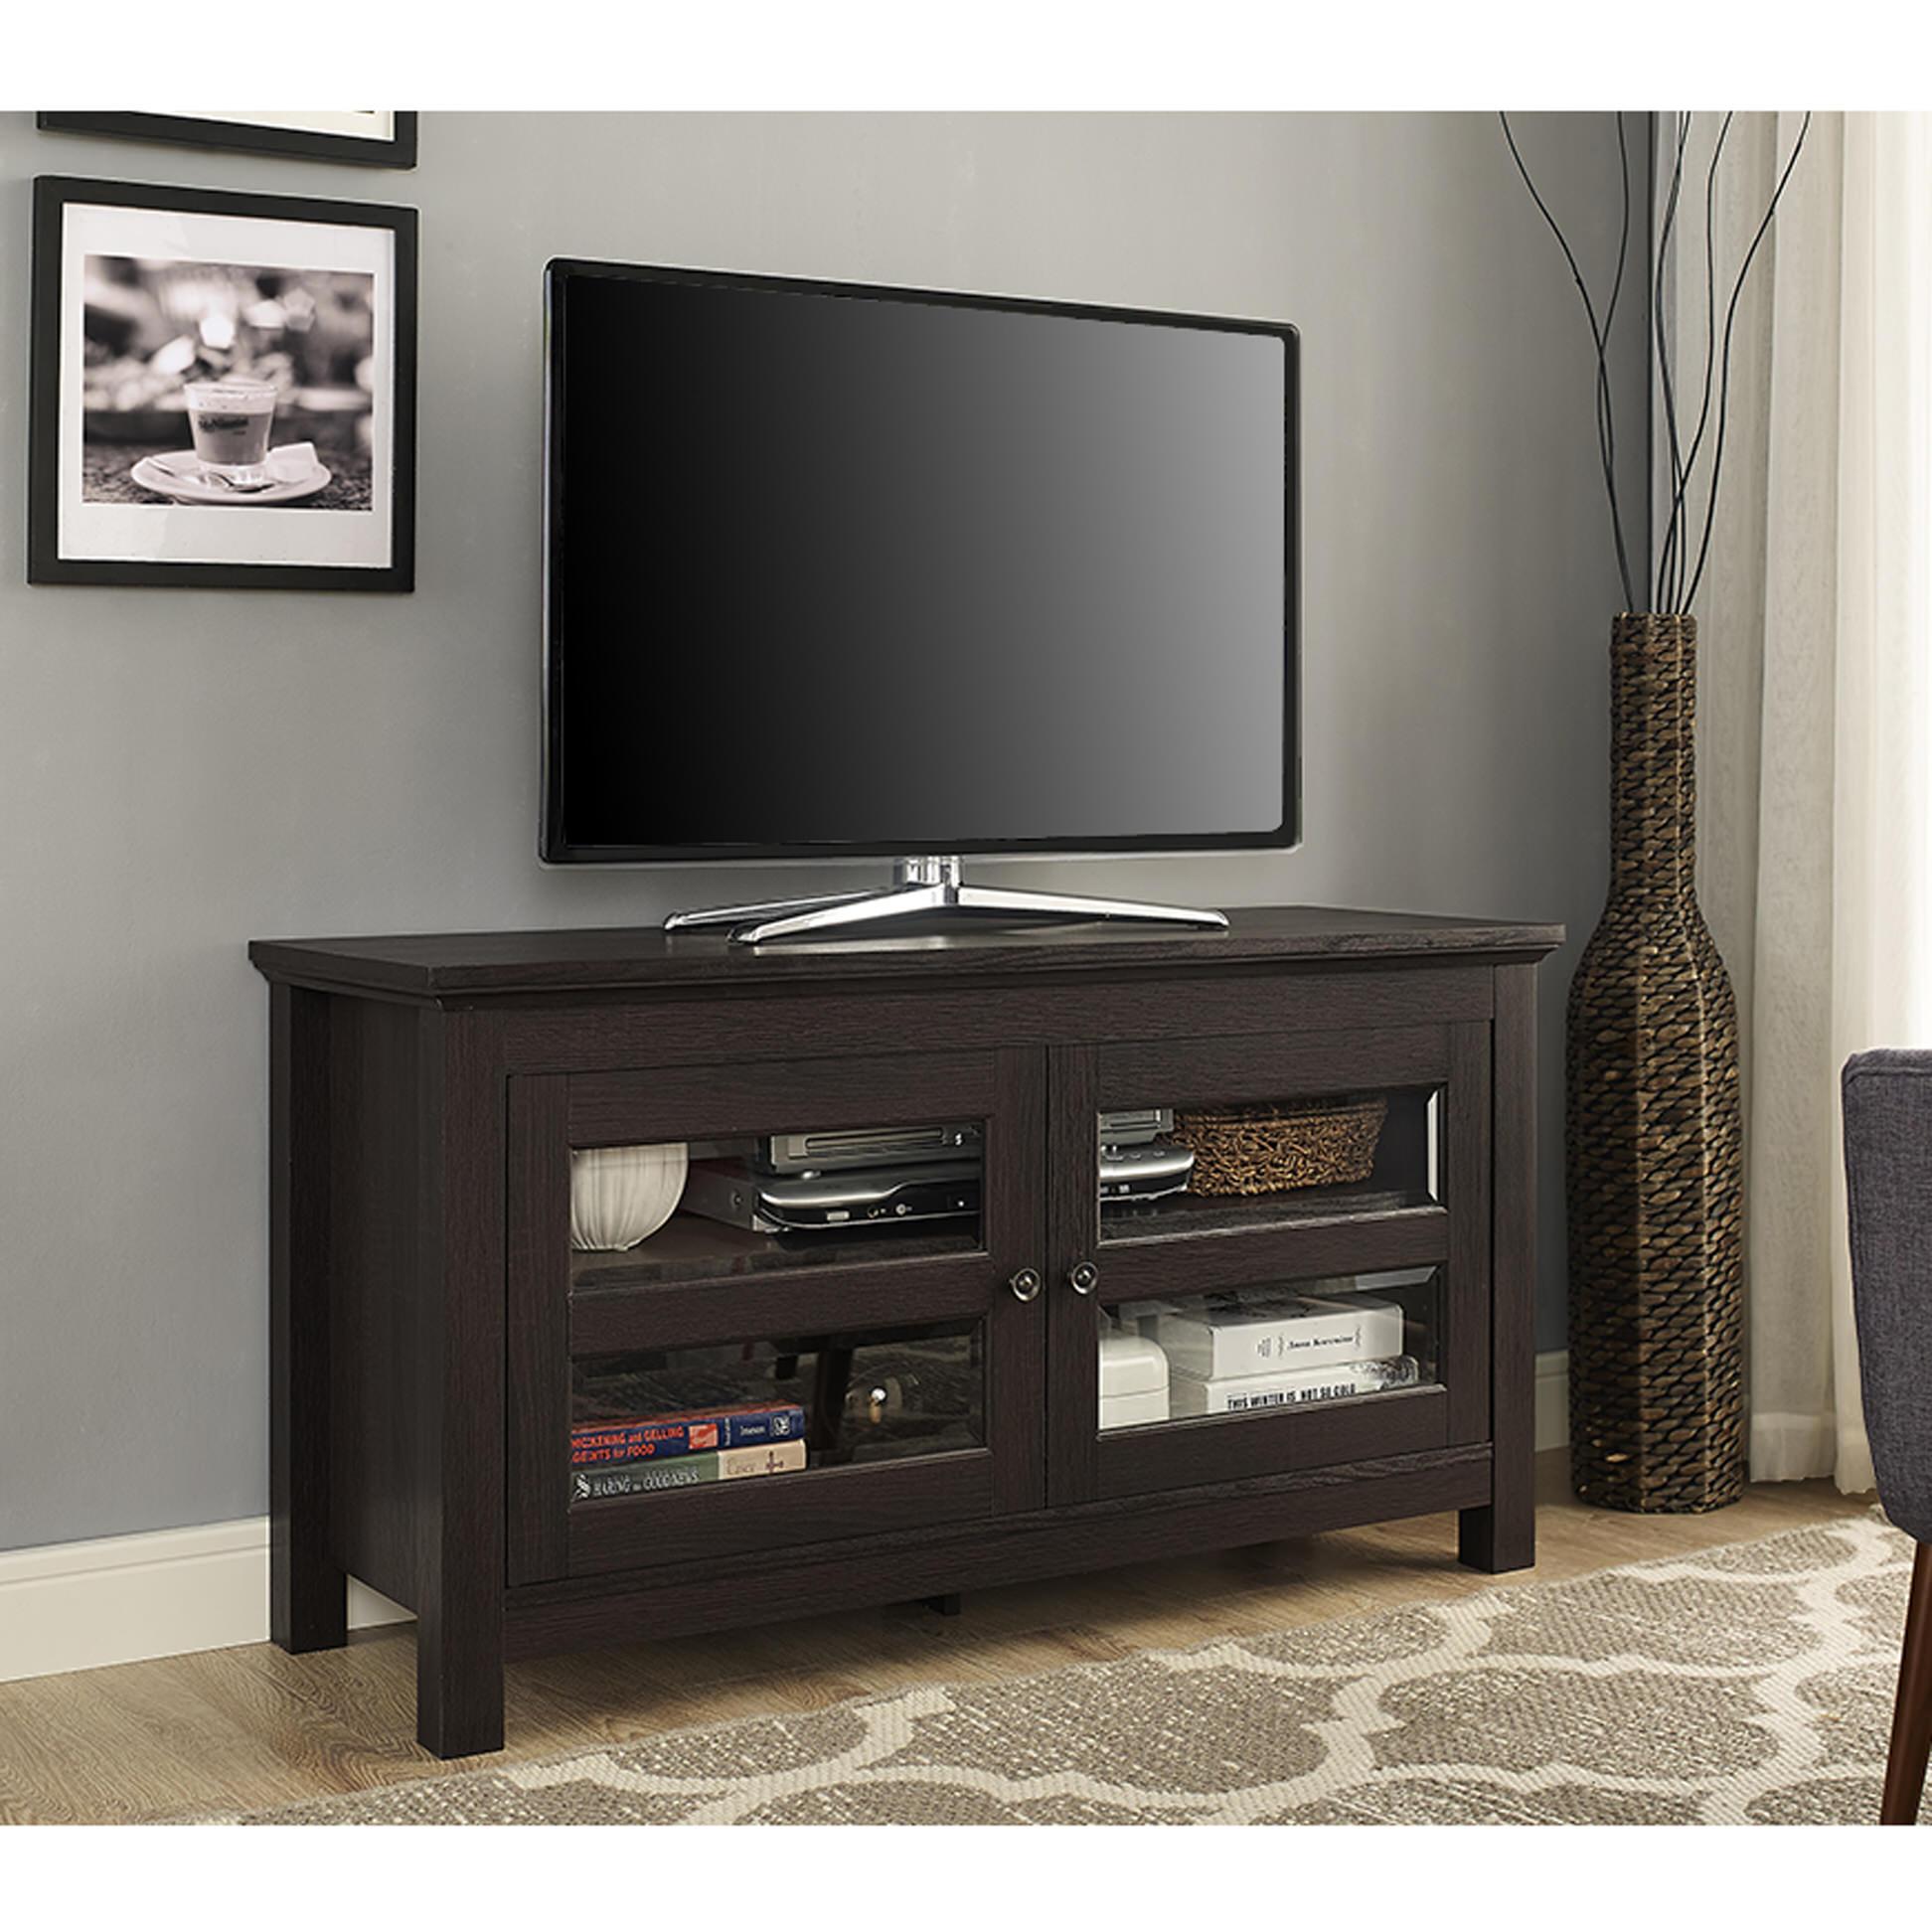 Inch wood tv console espresso by walker edison